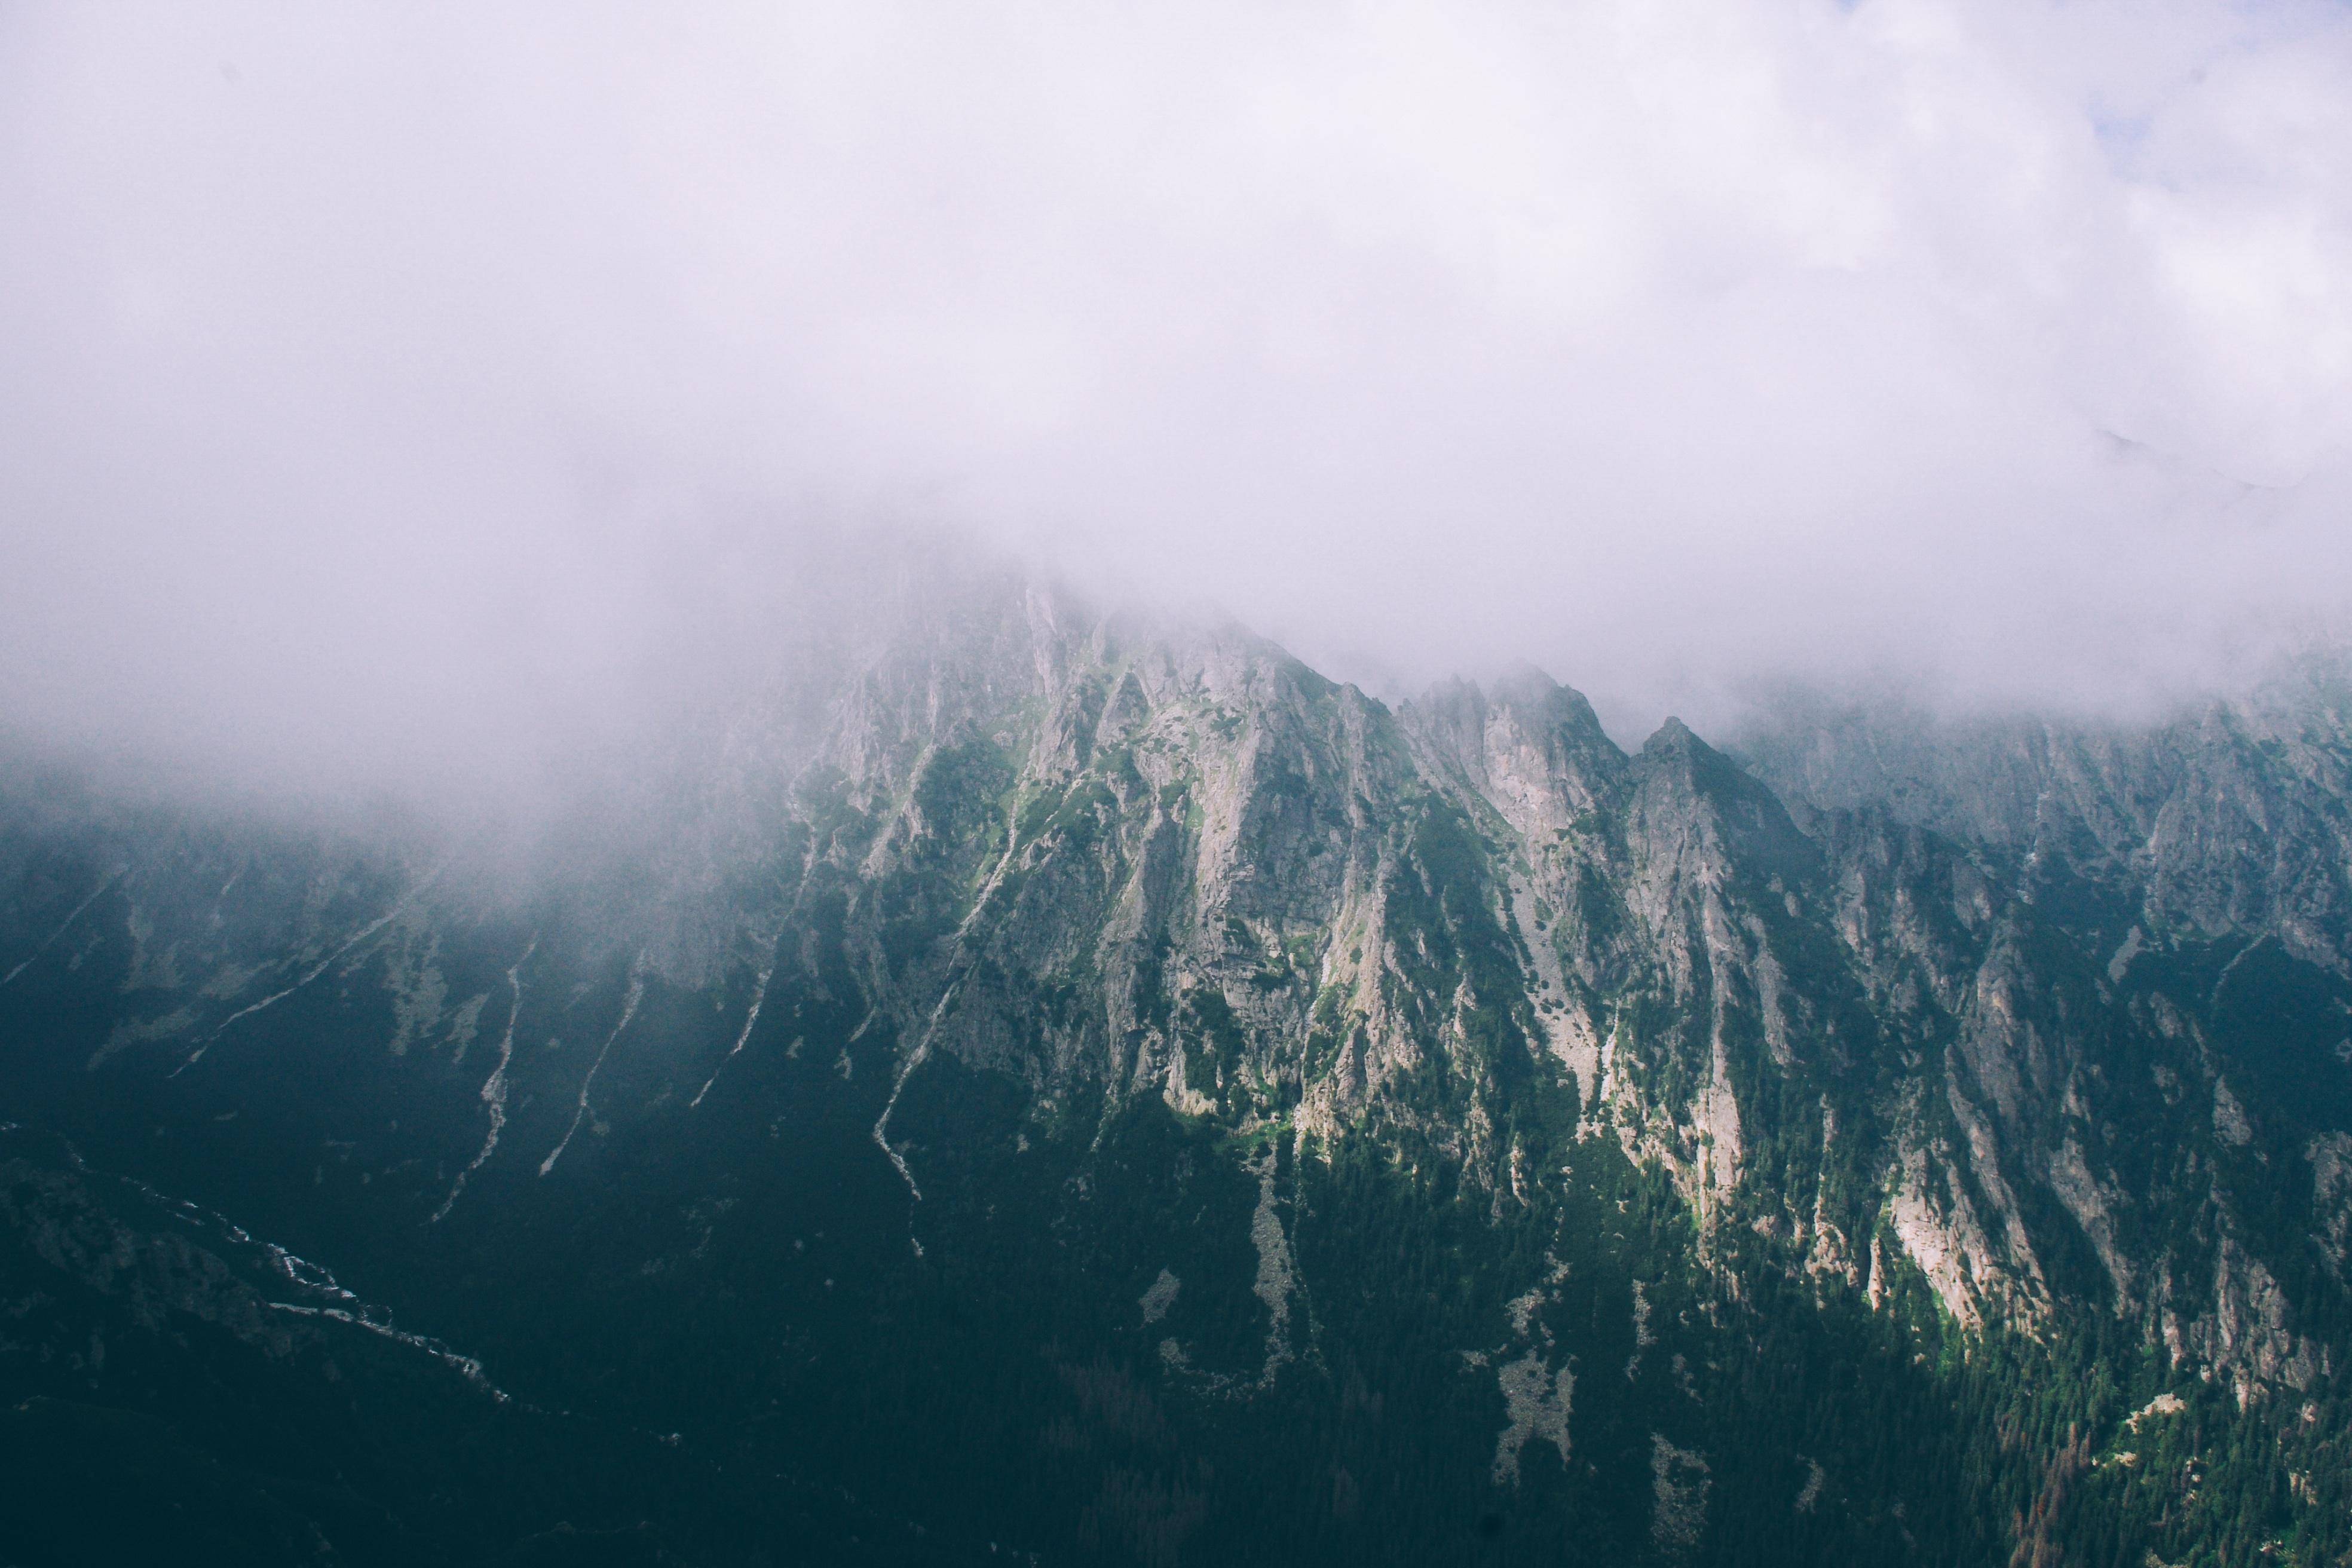 Good Wallpaper Mountain Fog - nature-forest-mountain-snow-cloud-sky-fog-mist-sunlight-morning-hill-mountain-range-weather-ridge-summit-alps-landform-geographical-feature-atmospheric-phenomenon-atmosphere-of-earth-mountainous-landforms-839  Collection_244960.jpg